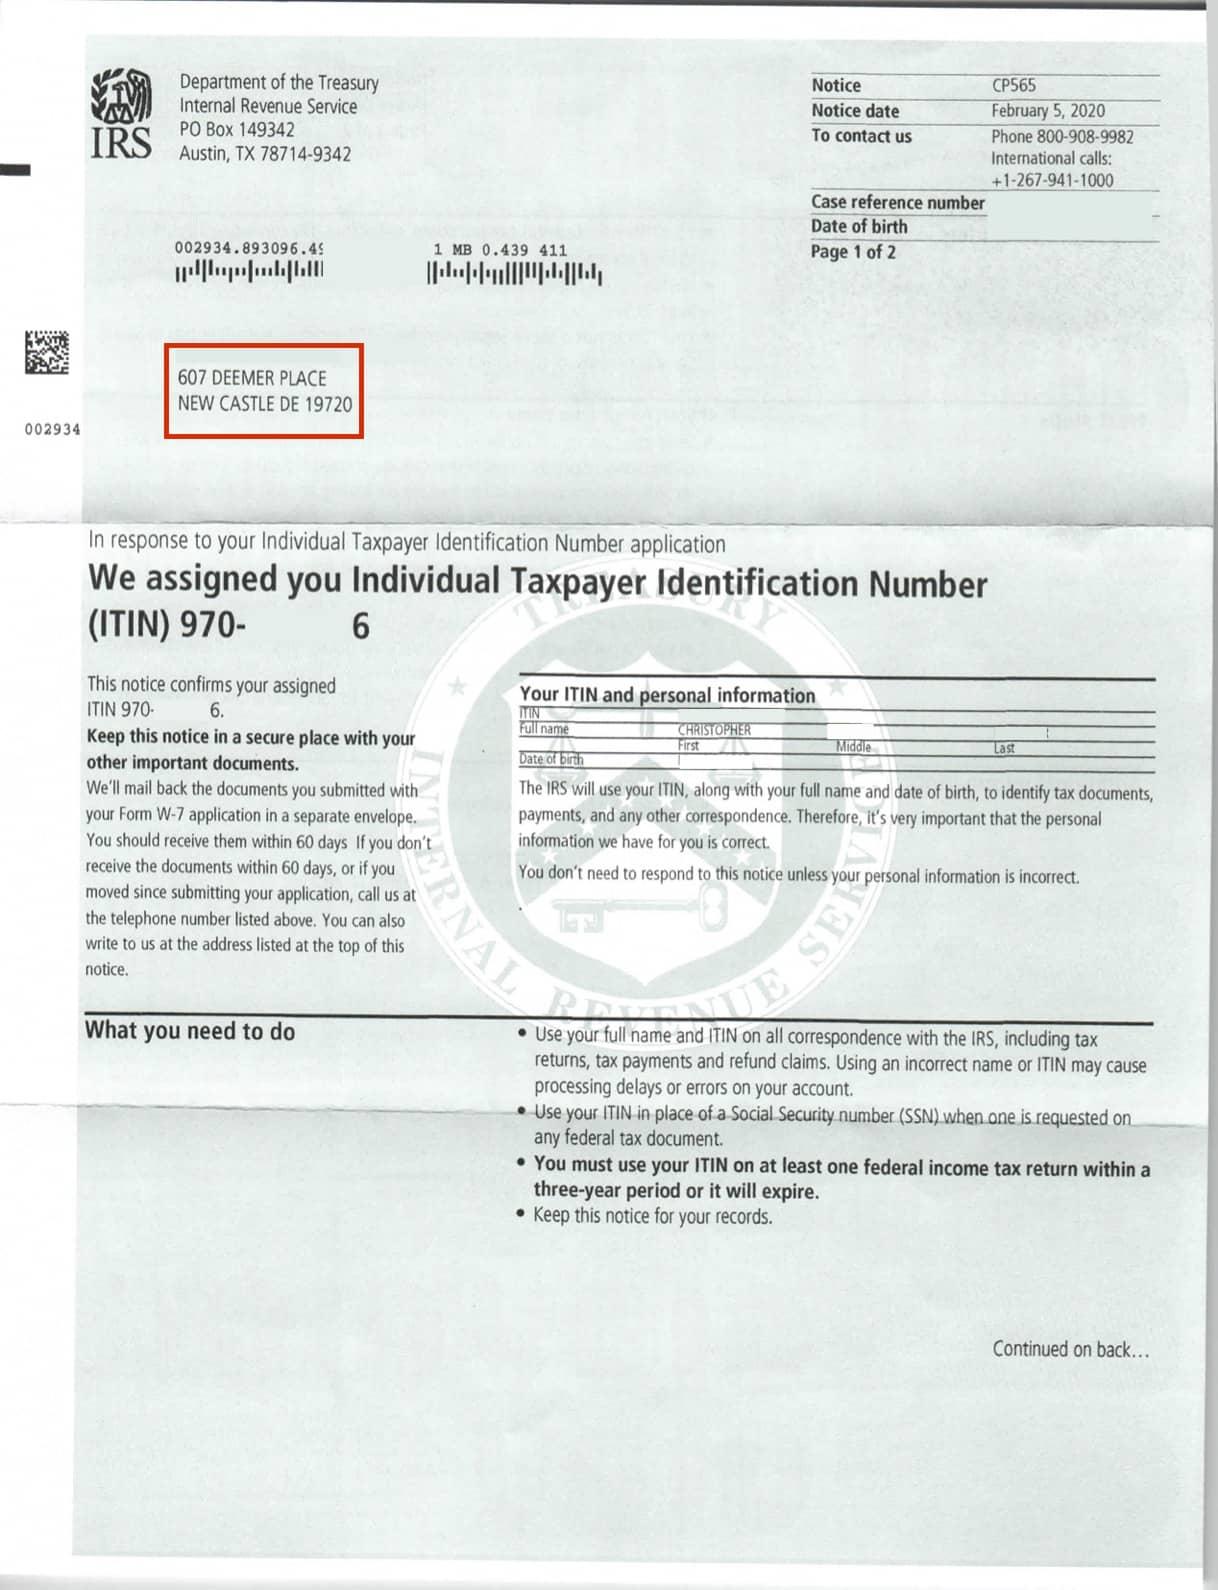 resultados-ITIN-IRS-primera-pagina